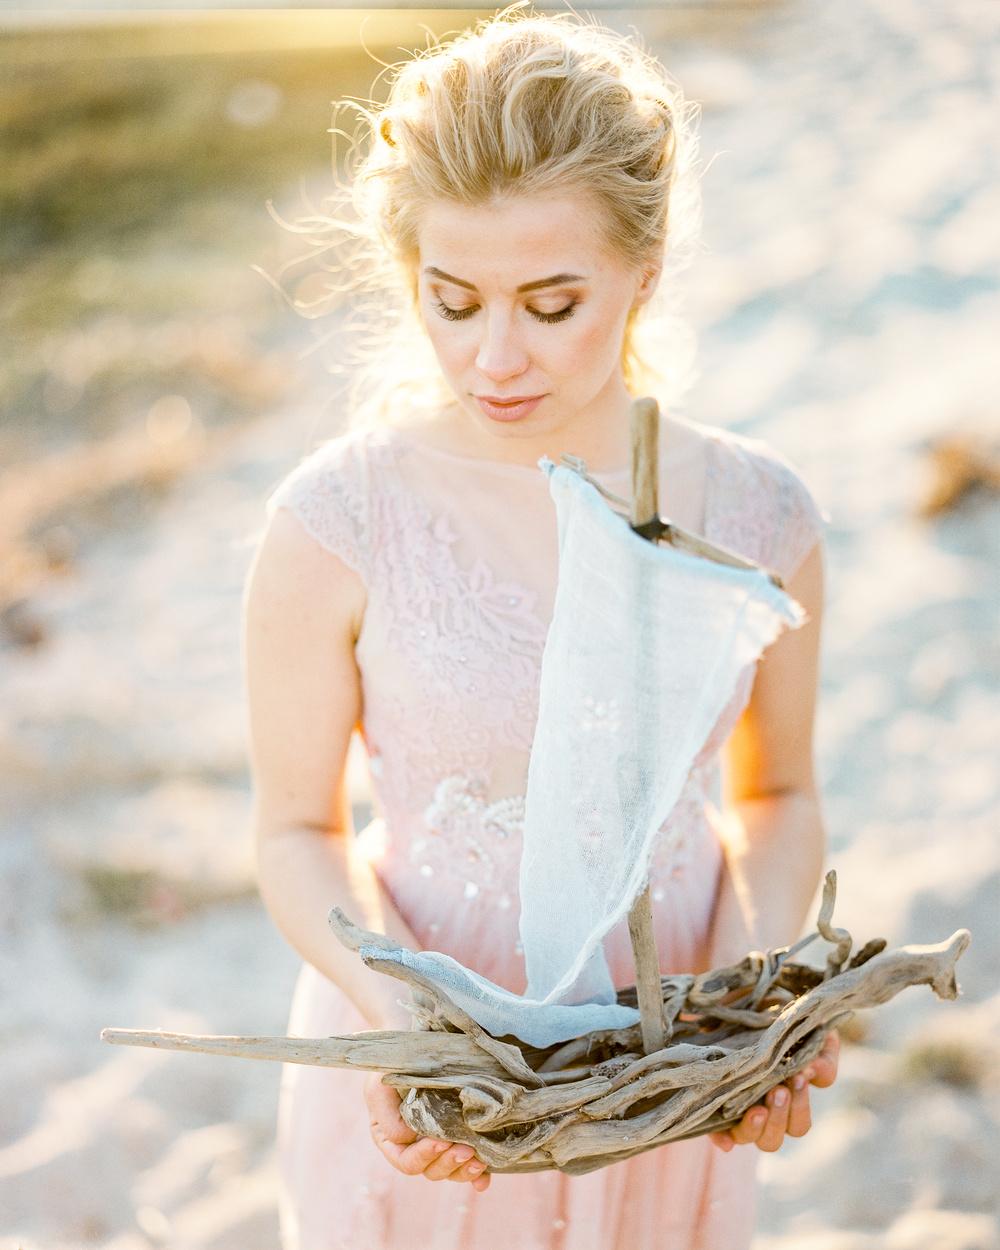 Bride holding decorative boat